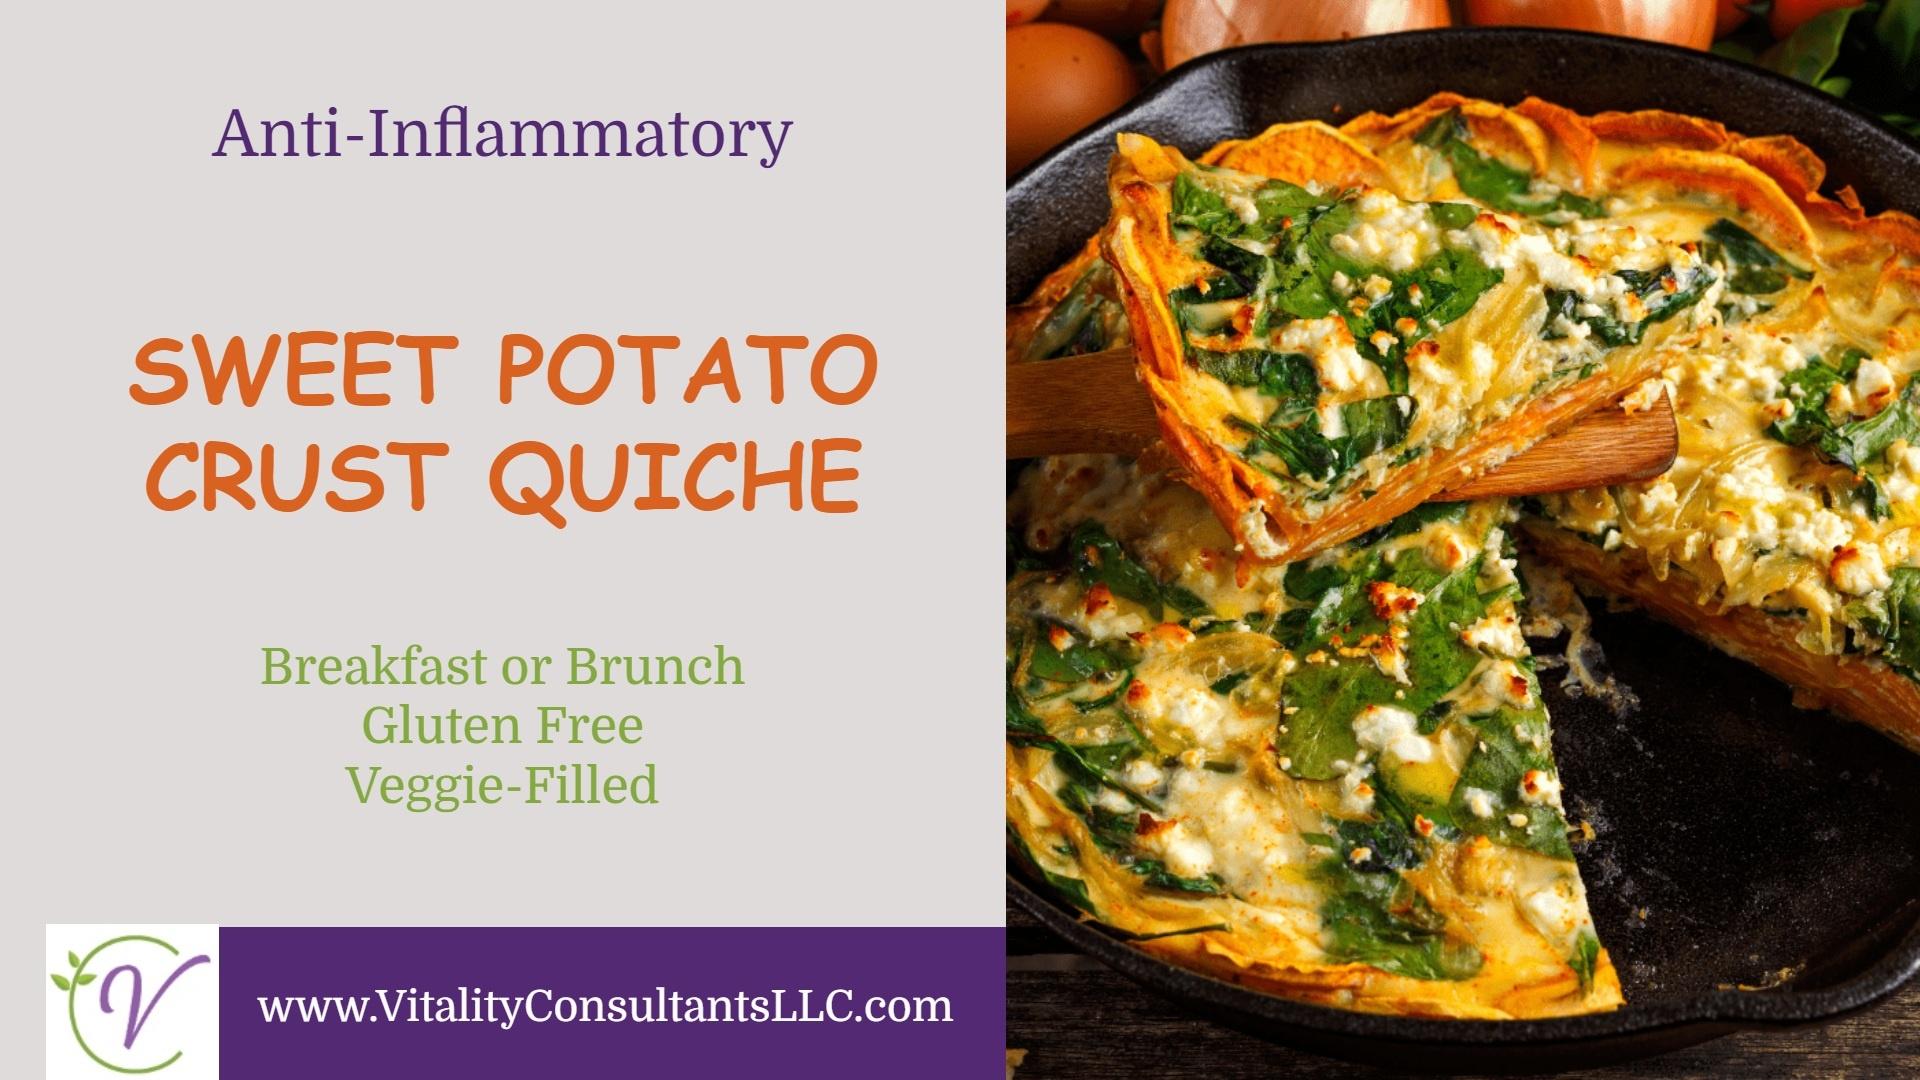 Sweet Potato Crust Quiche